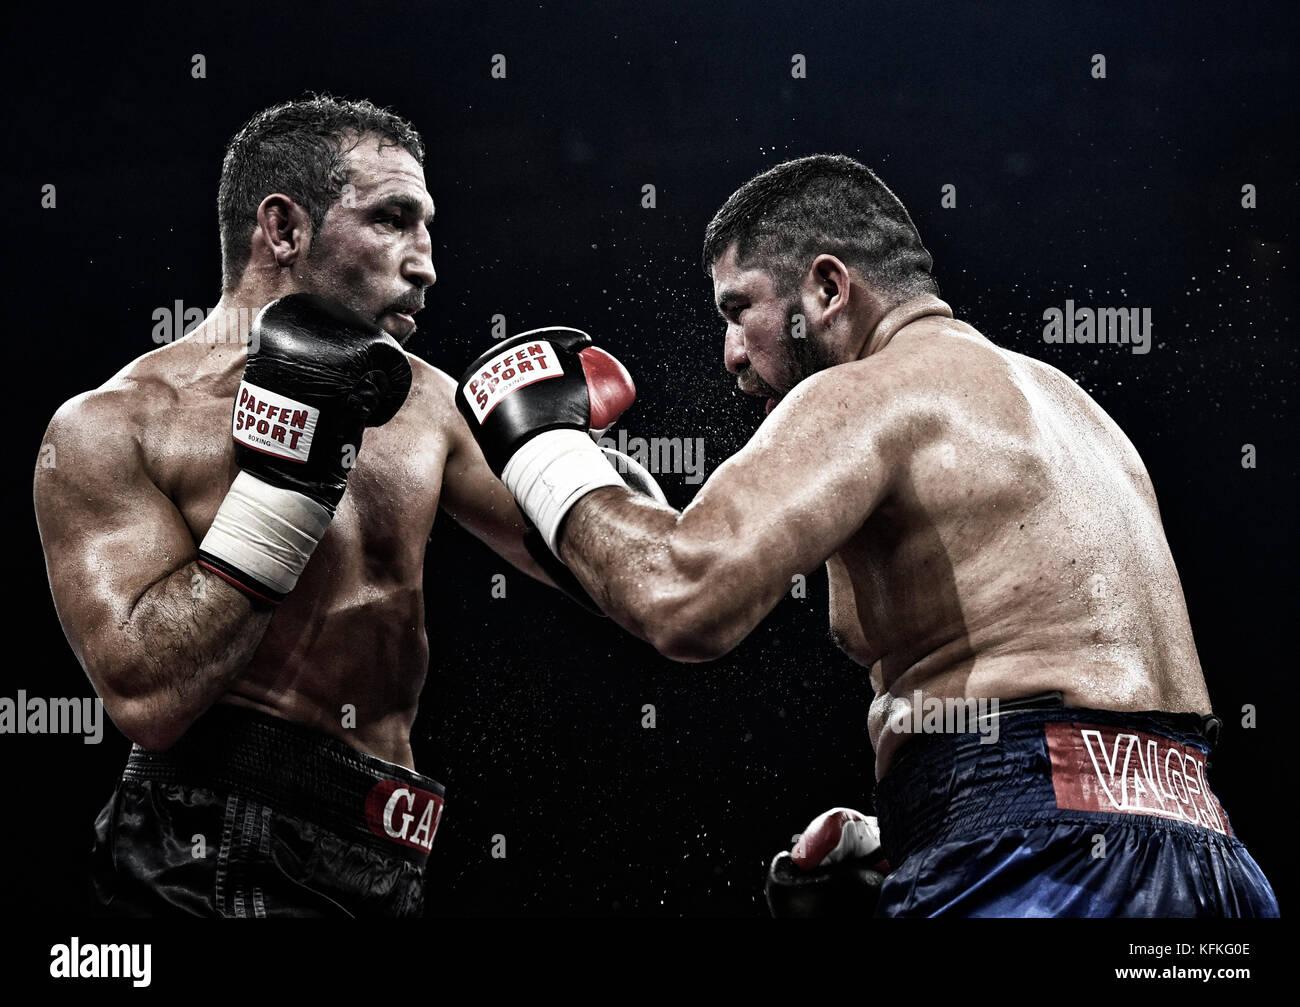 Boxing match, Firat Arslan, GBR, black trousers against Alejandro Emilio Valori, ARG, blue trousers, Hanns-Martin - Stock Image